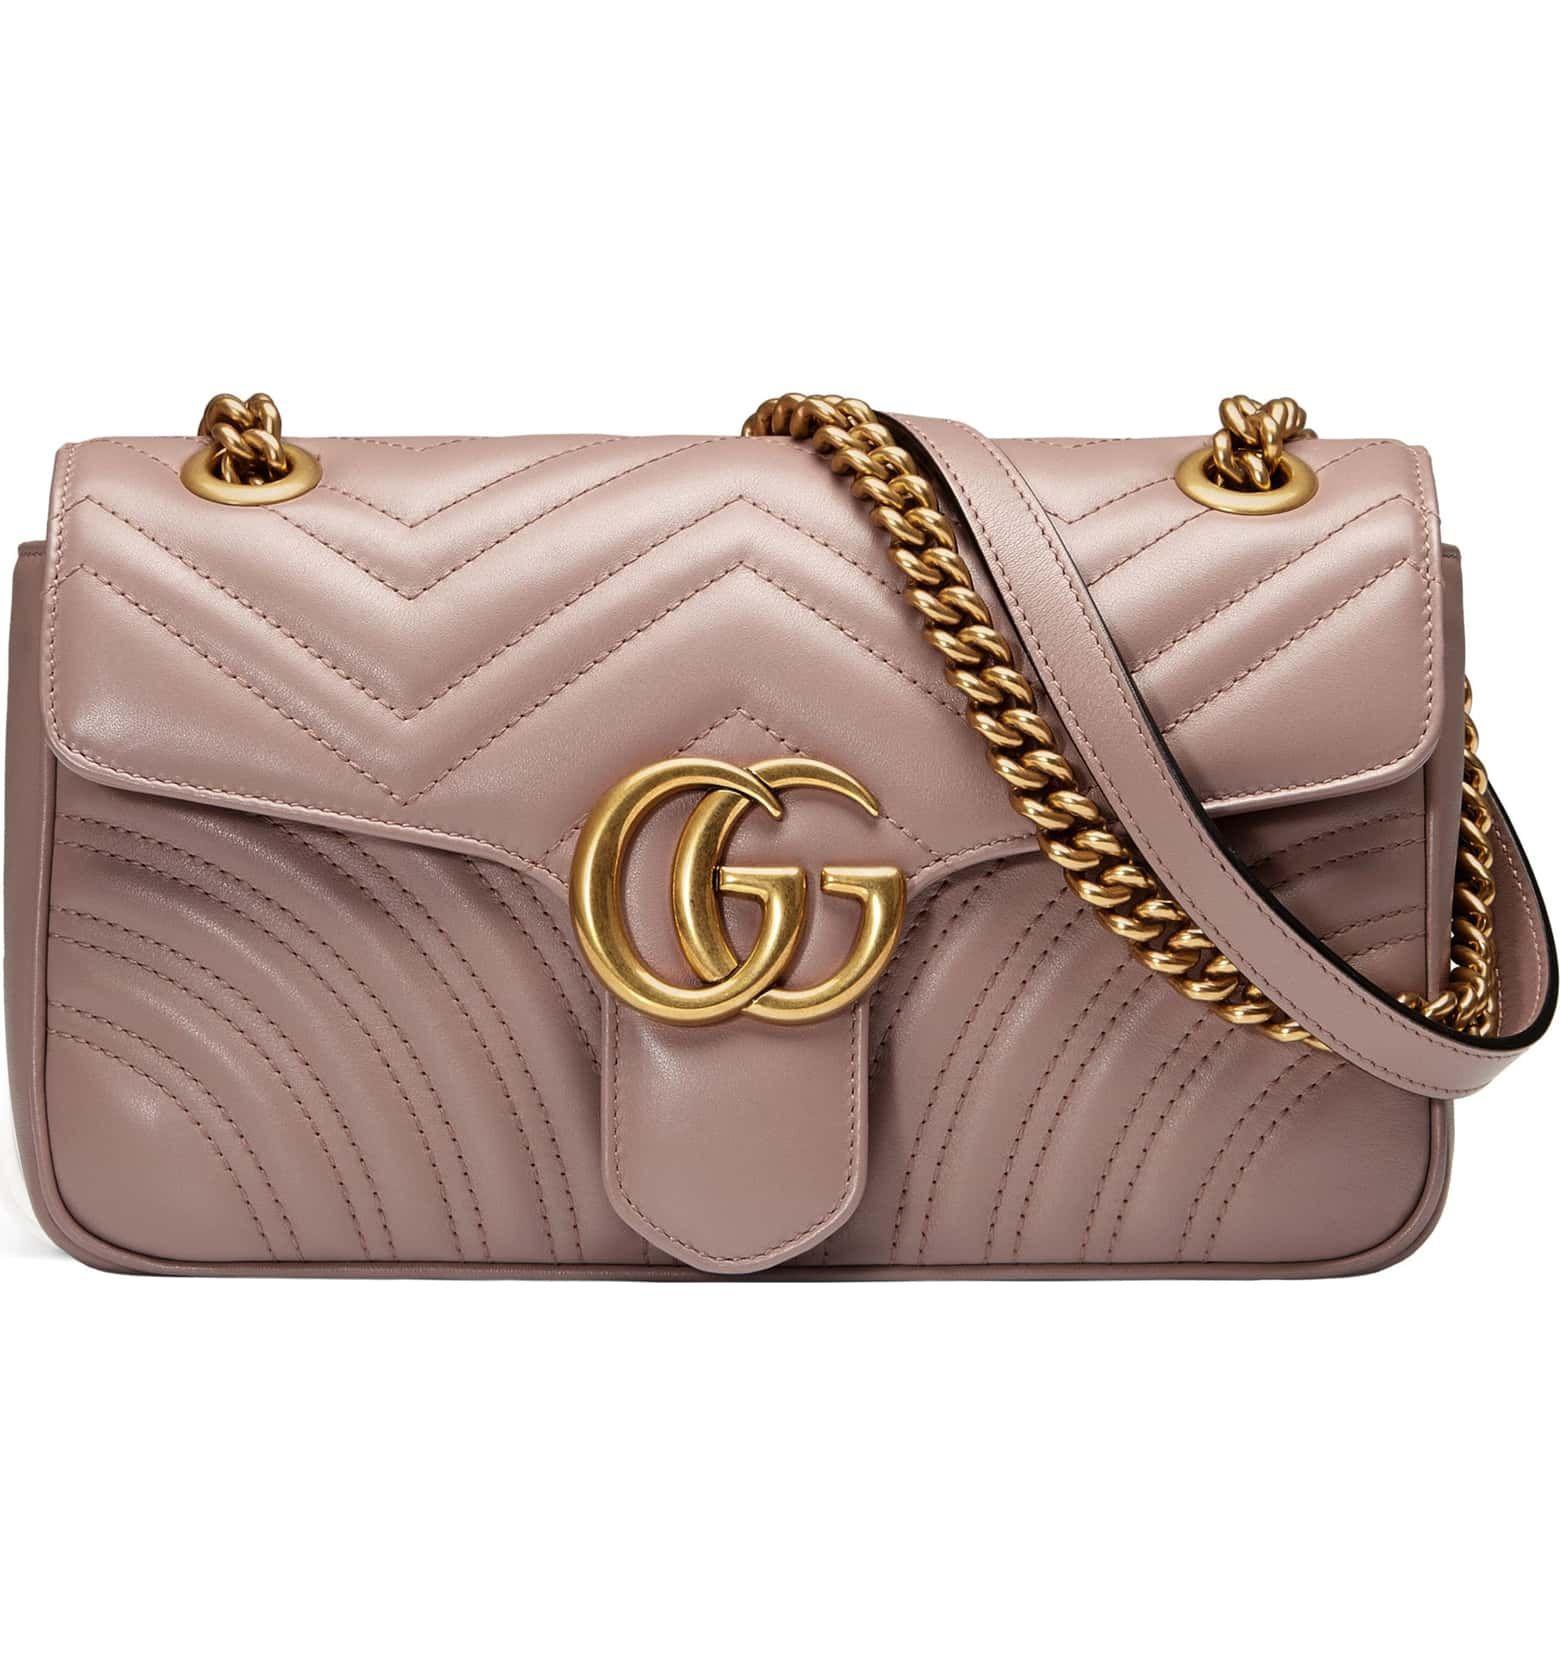 4aba18601a0 Small GG Marmont 2.0 Matelassé Leather Shoulder Bag